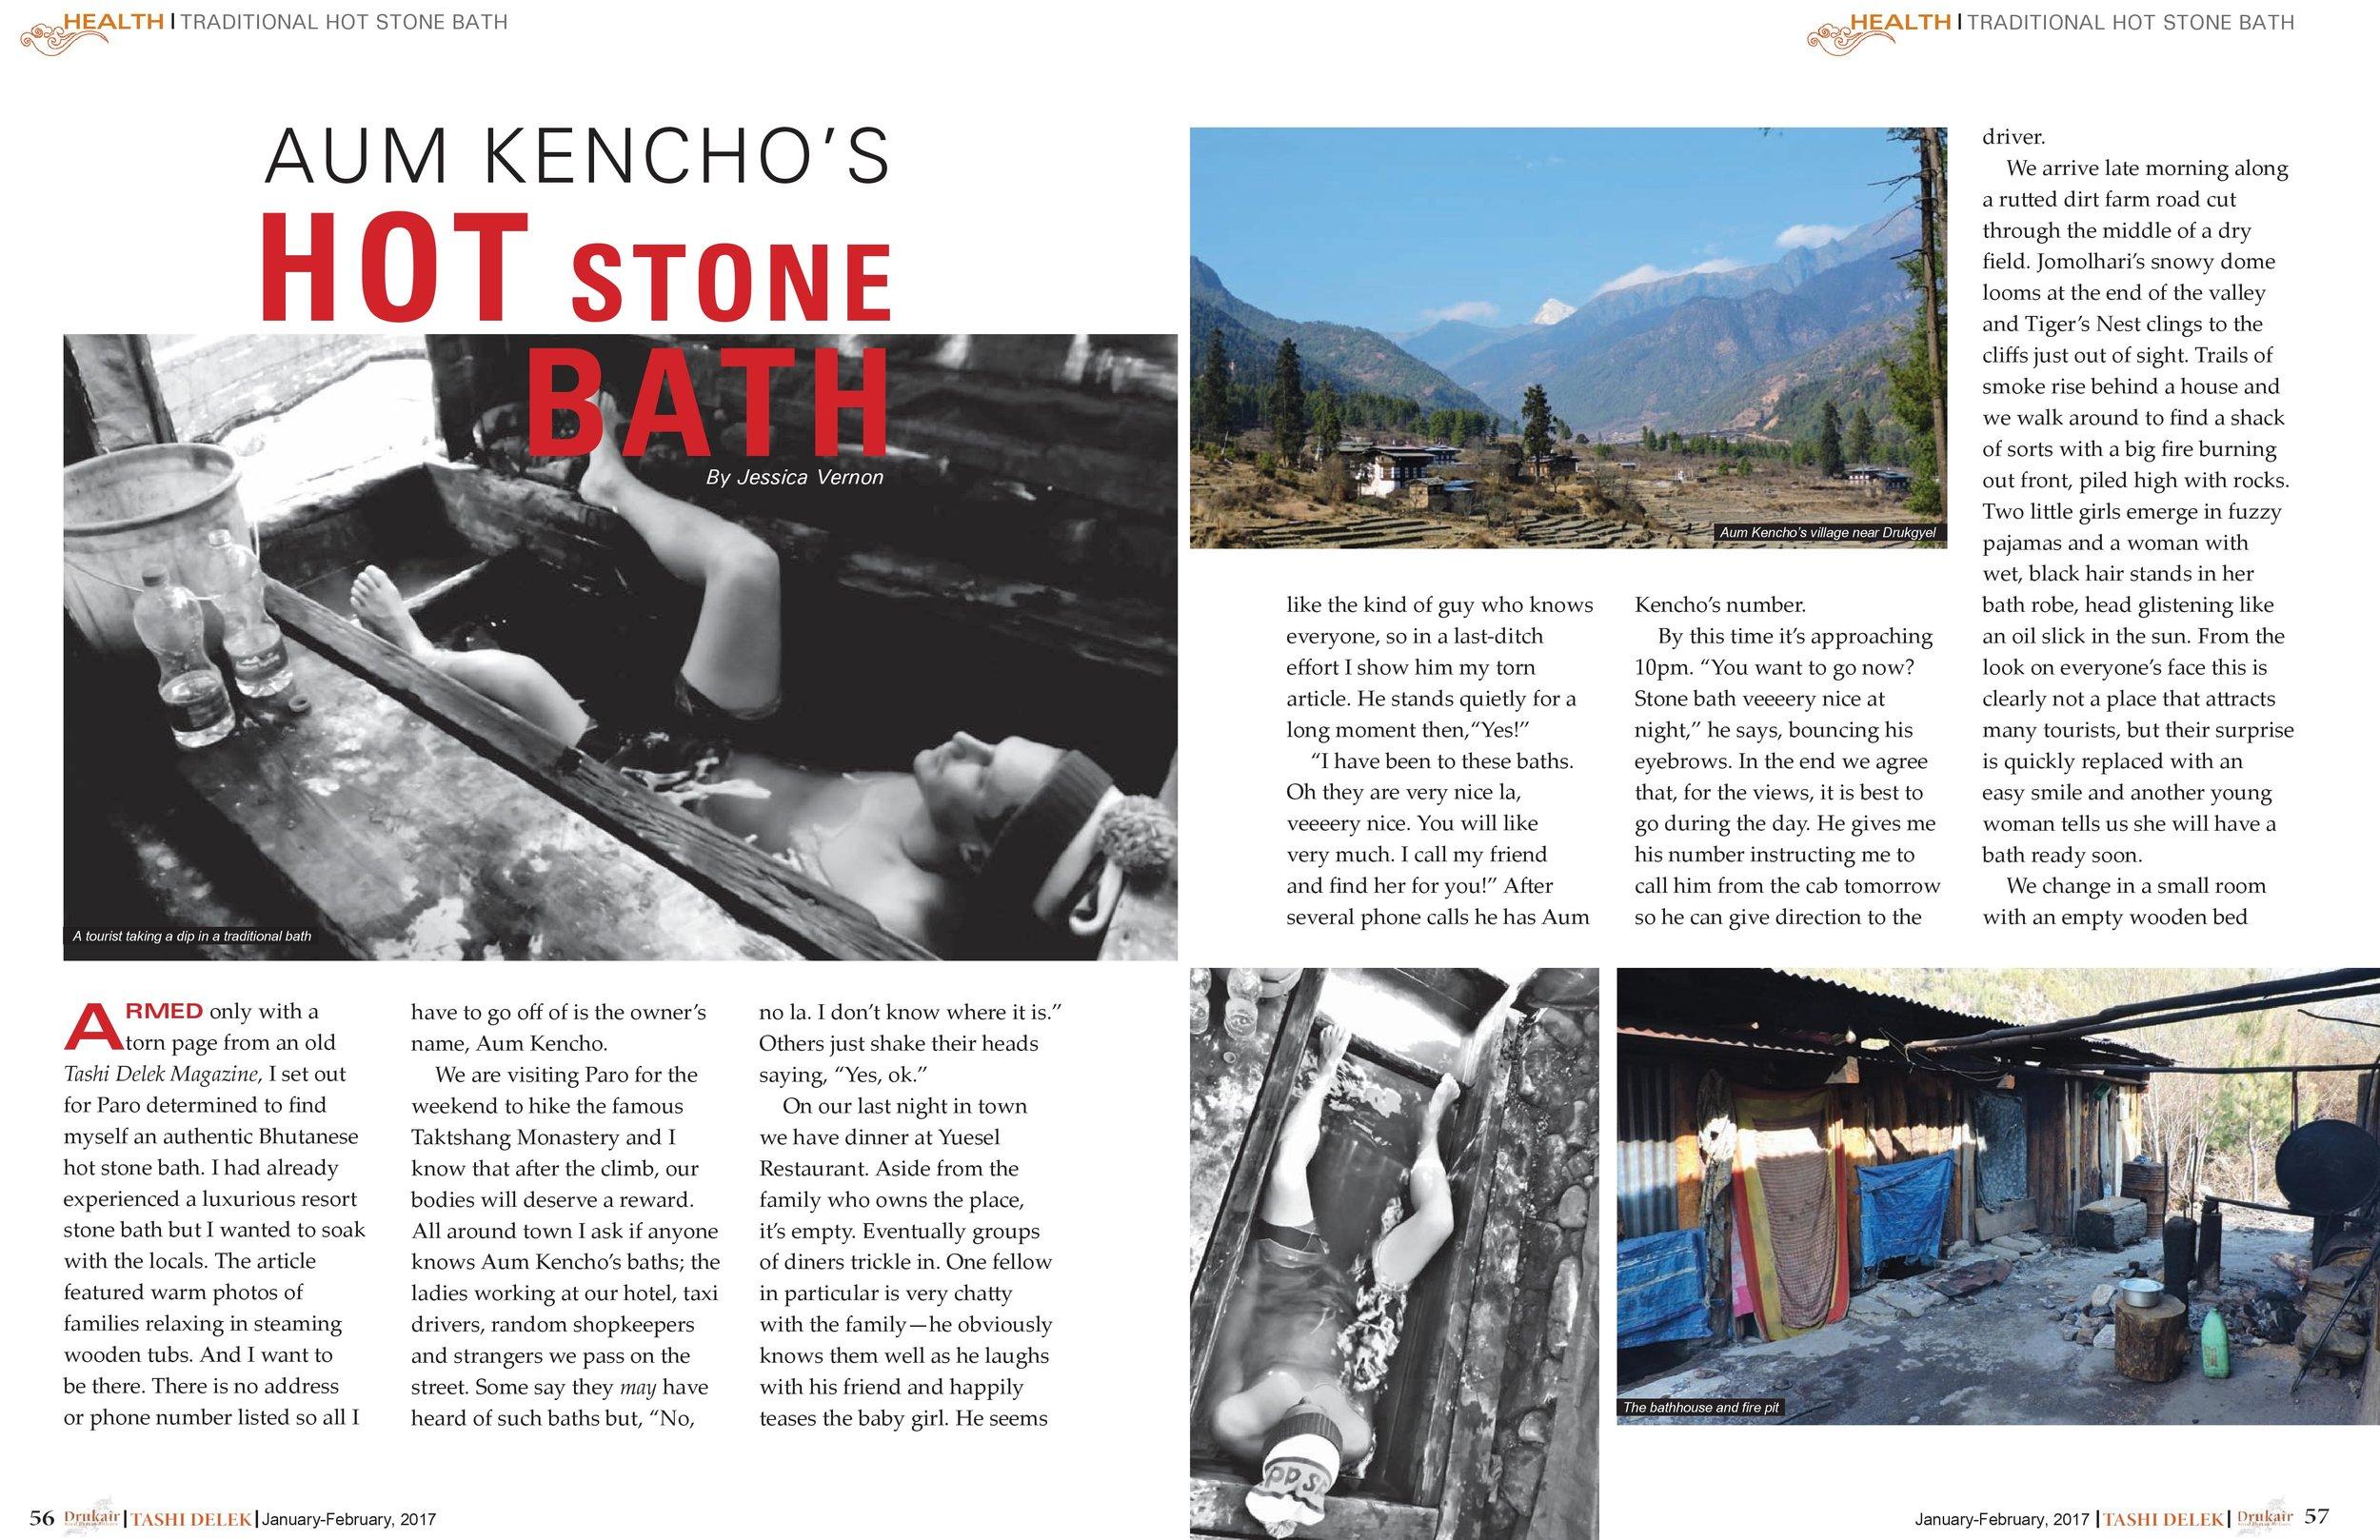 Jan. 2017: Aum Kencho's Hot Stone Bath